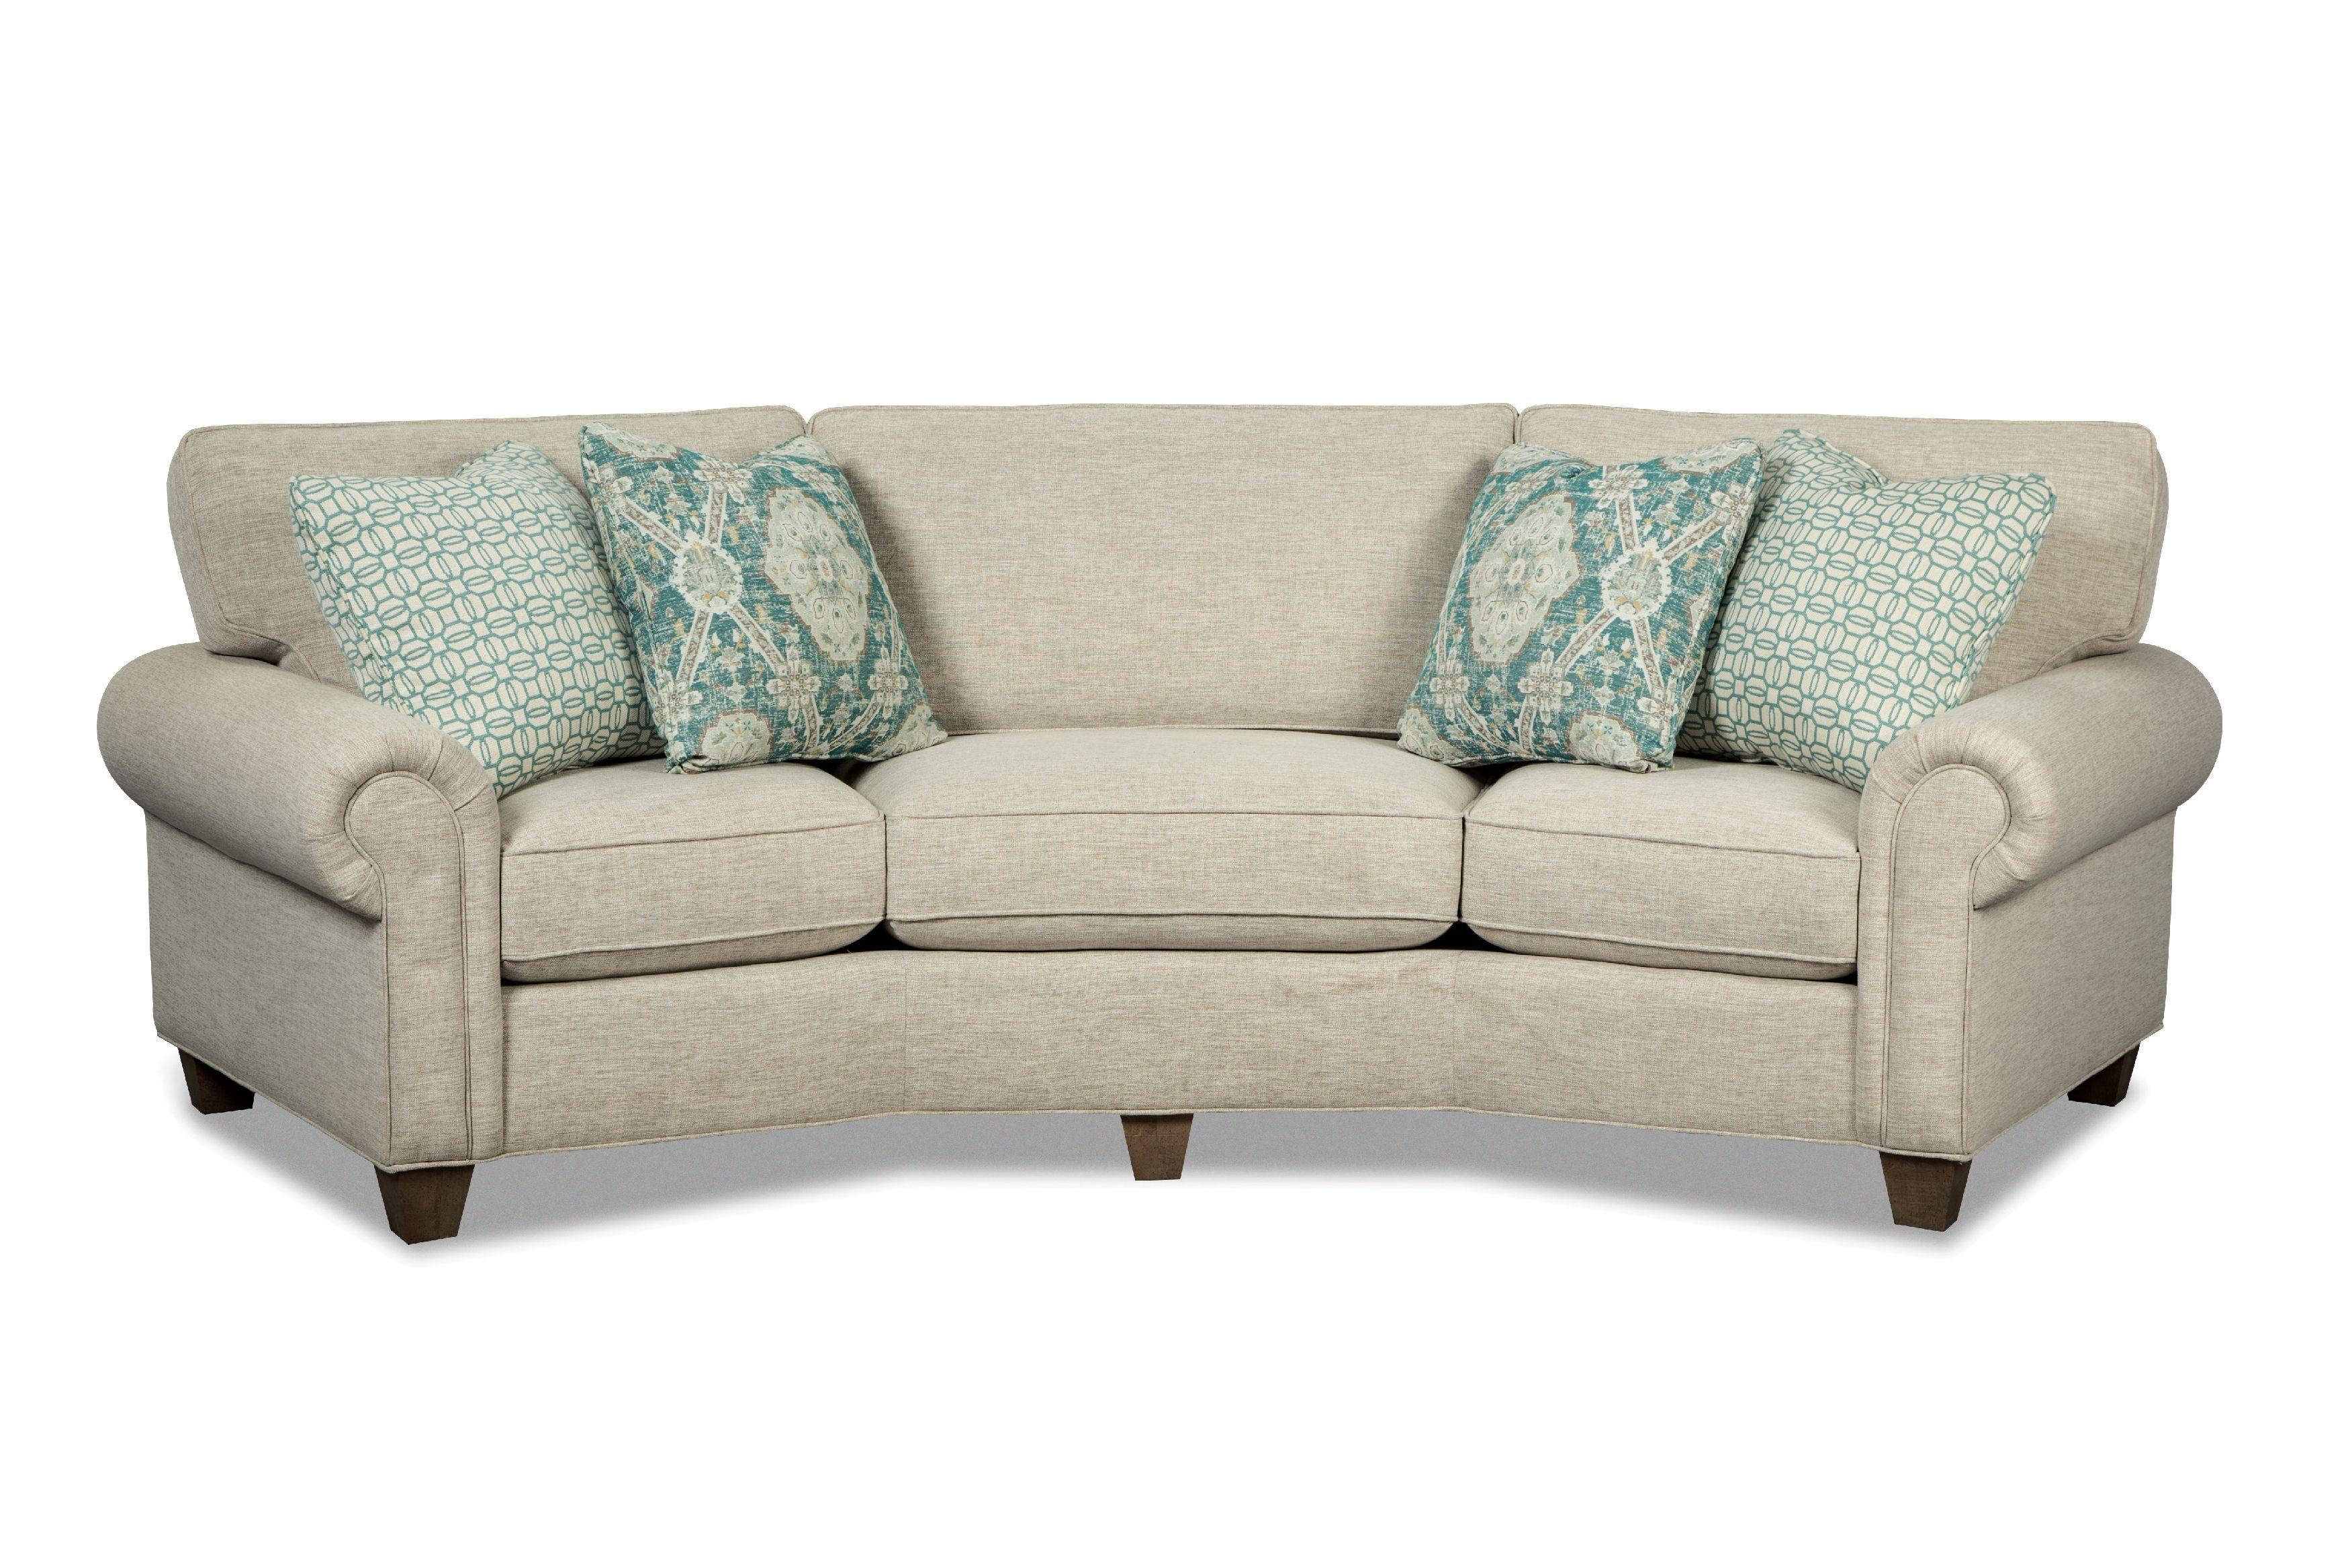 ... Cozy Life Sofa C9 ...